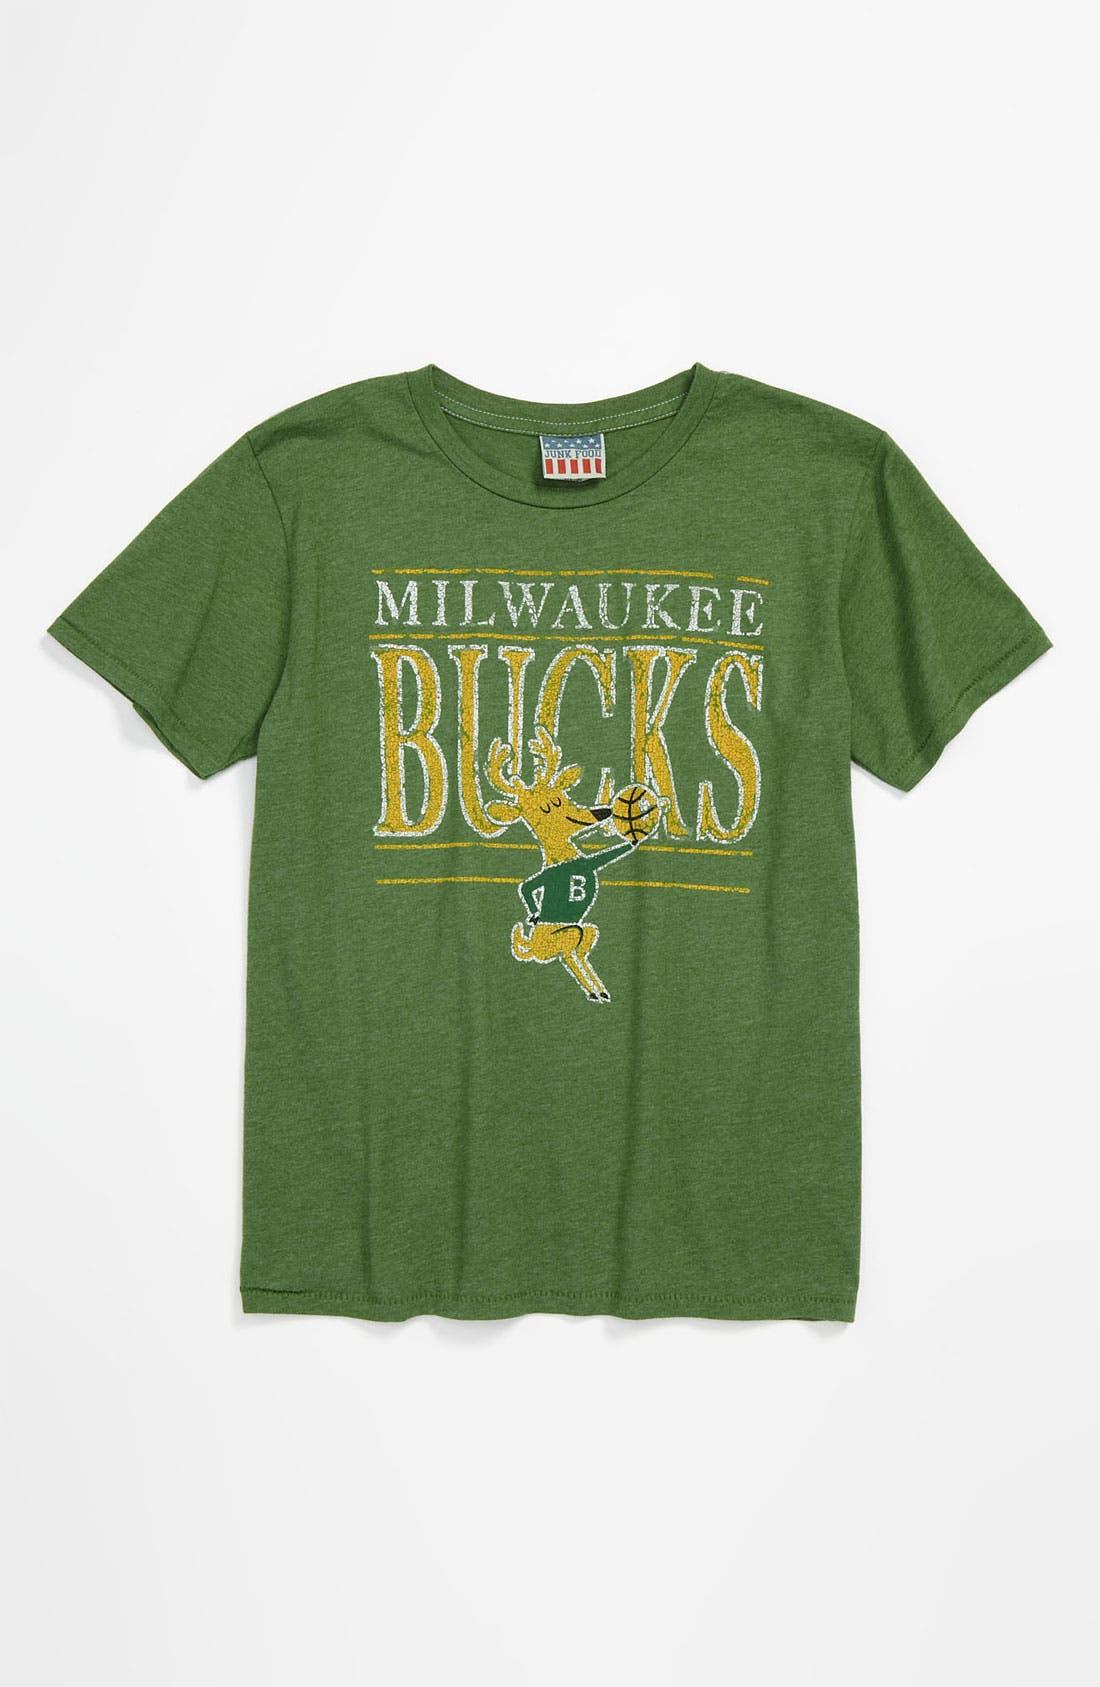 Alternate Image 1 Selected - Junk Food 'Milwaukee Bucks' T-Shirt (Little Boys & Big Boys)